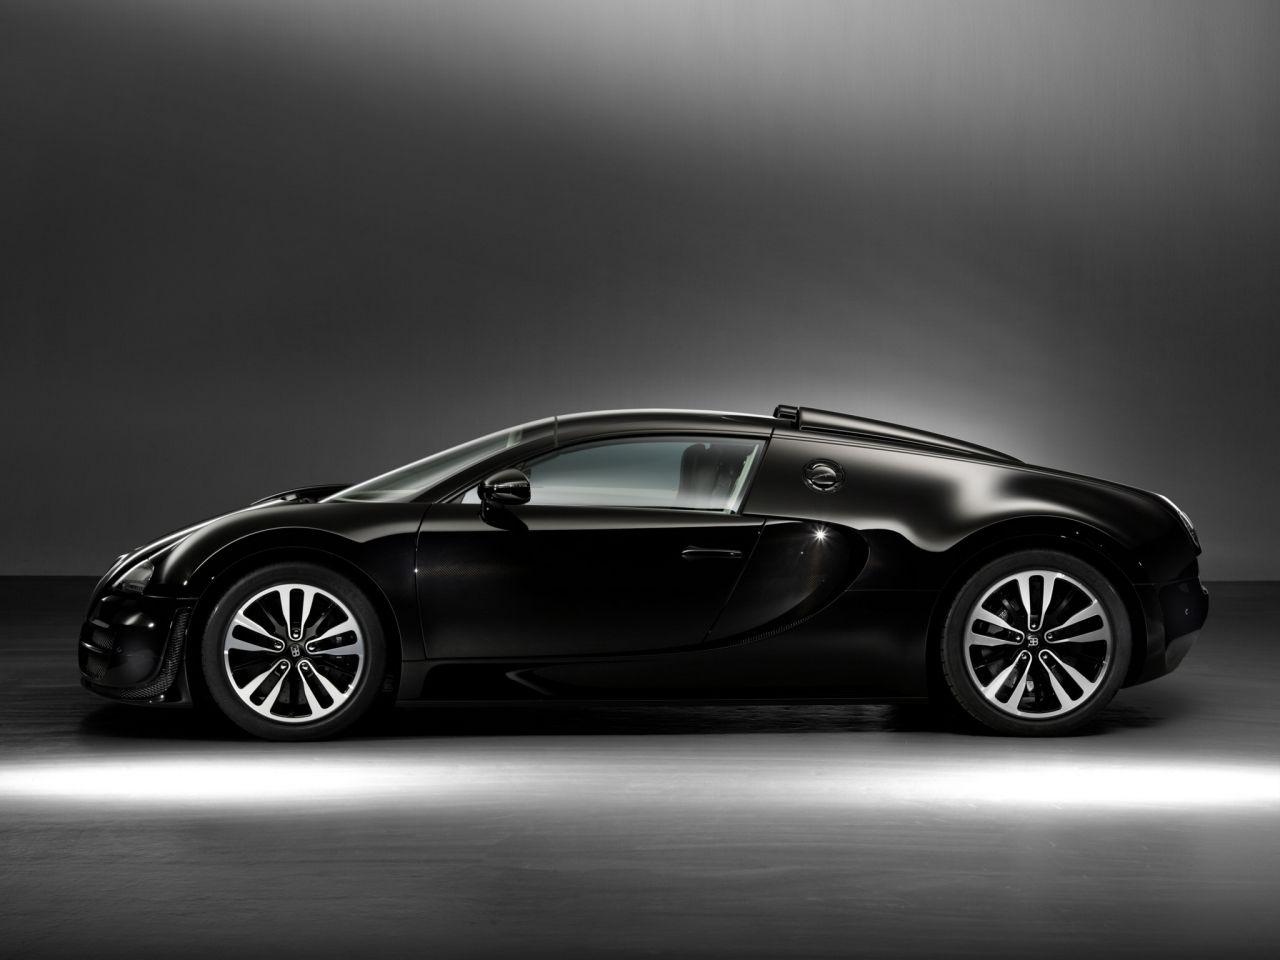 Bugatti-Veyron-Grand-Sport-Vitesse-Jean-Bugatti-01.jpg